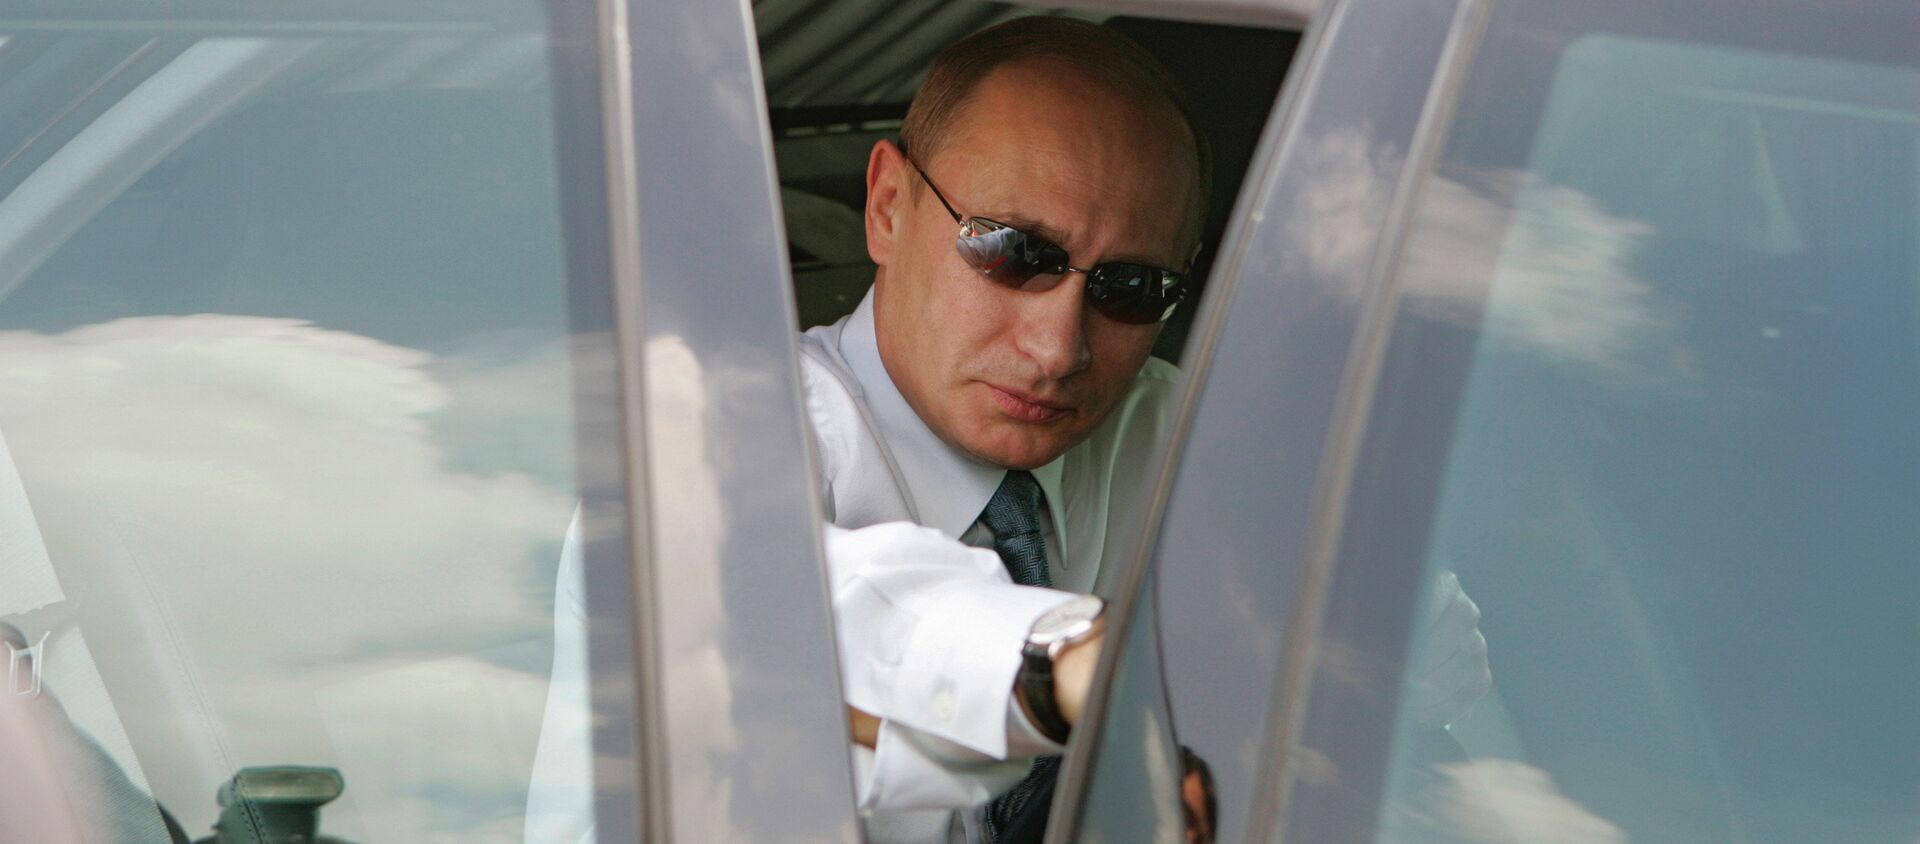 Президент России Владимир Путин прибыл в Ханой (Вьетнам) - Sputnik Արմենիա, 1920, 07.07.2021